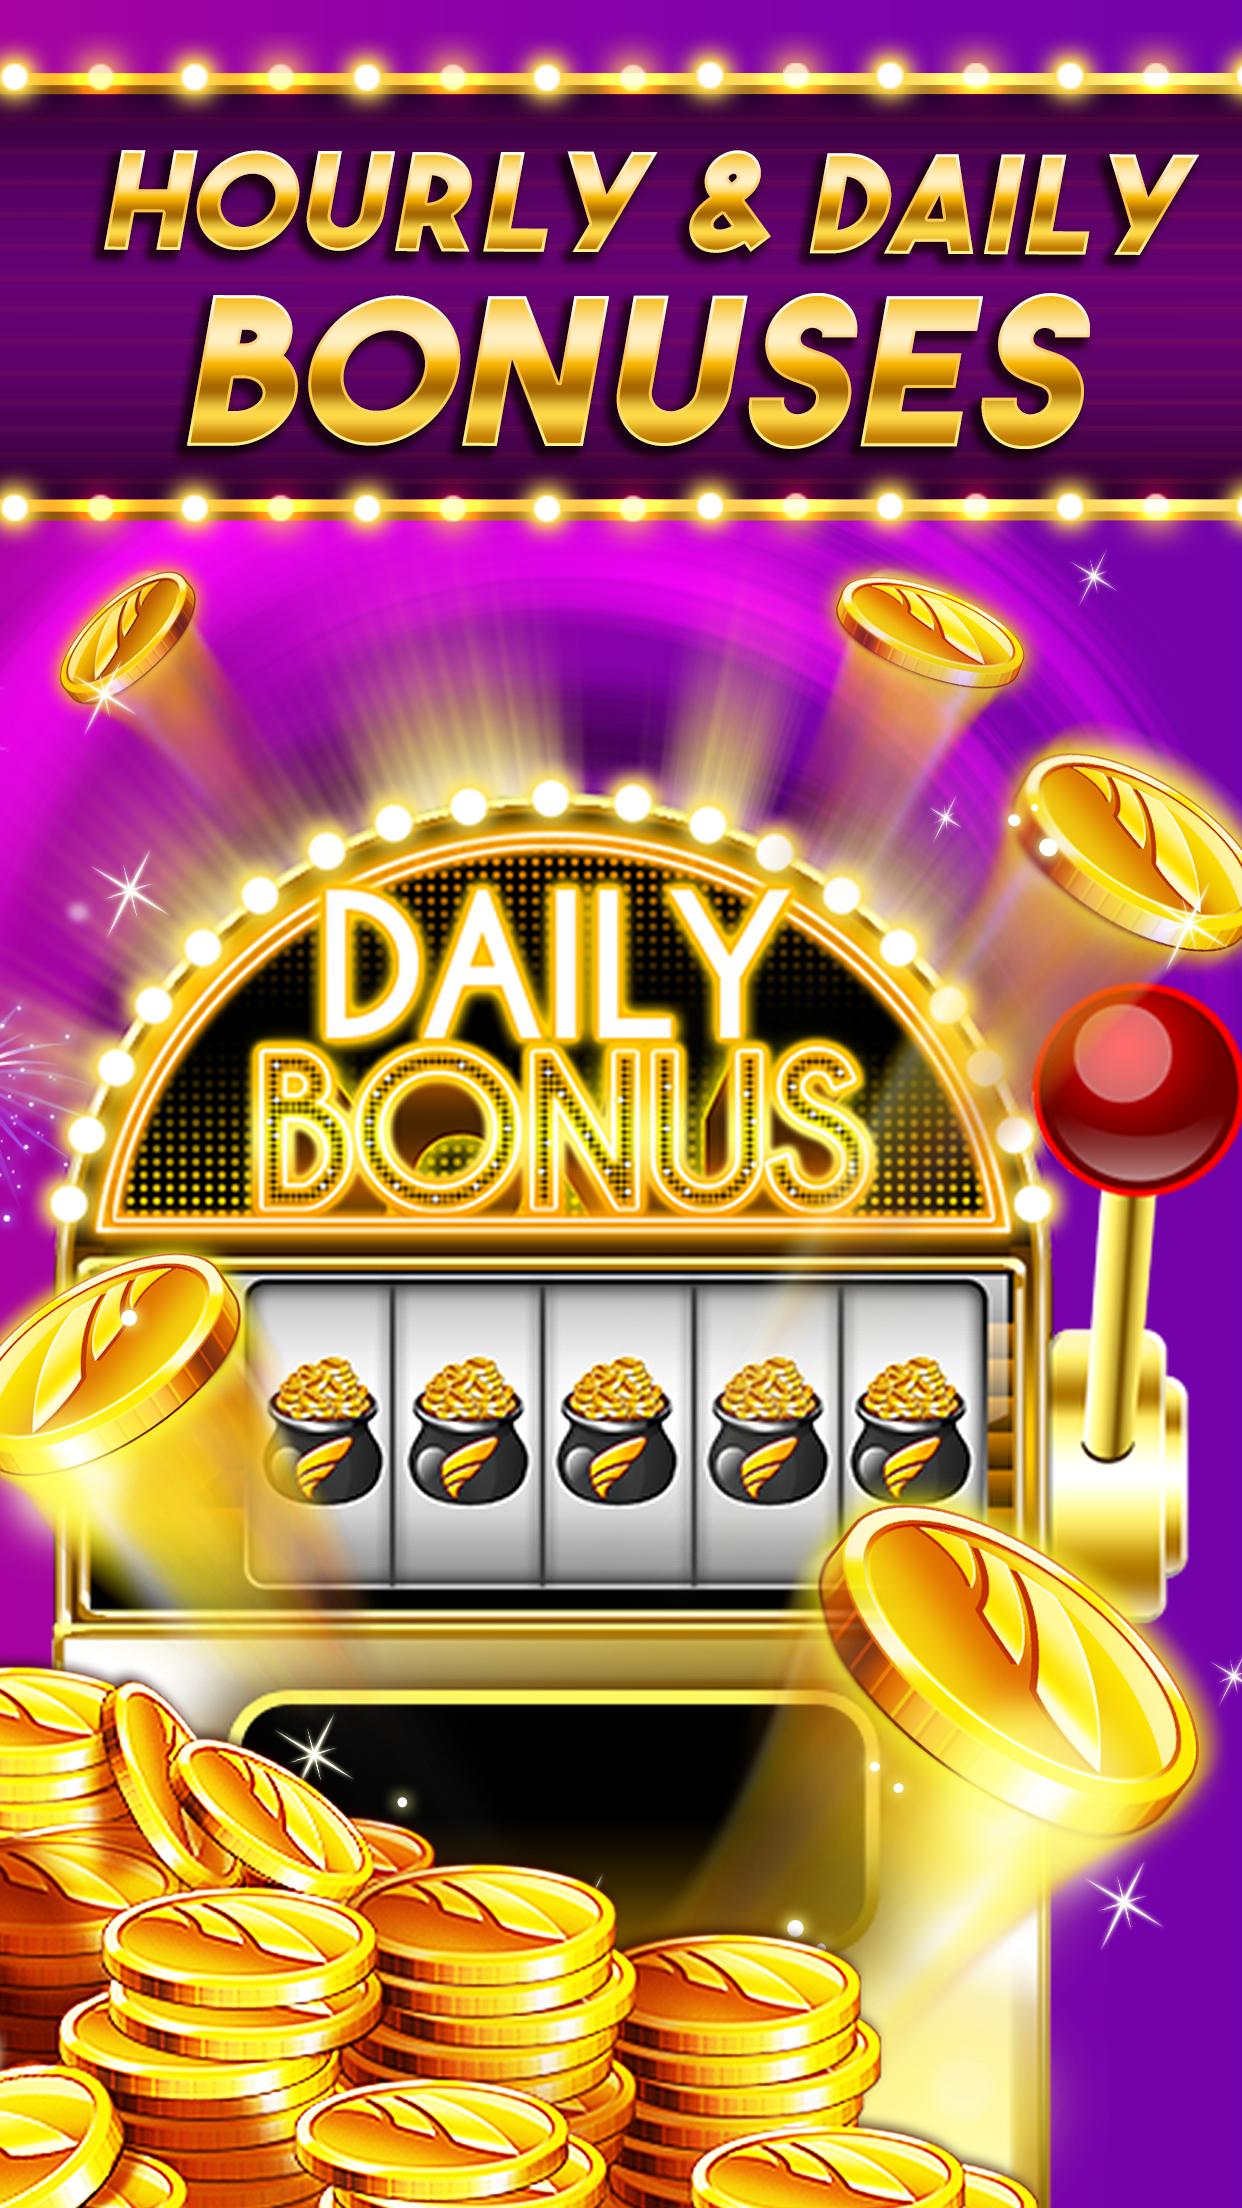 Casino Frenzy-Fantastic Slots Screenshot